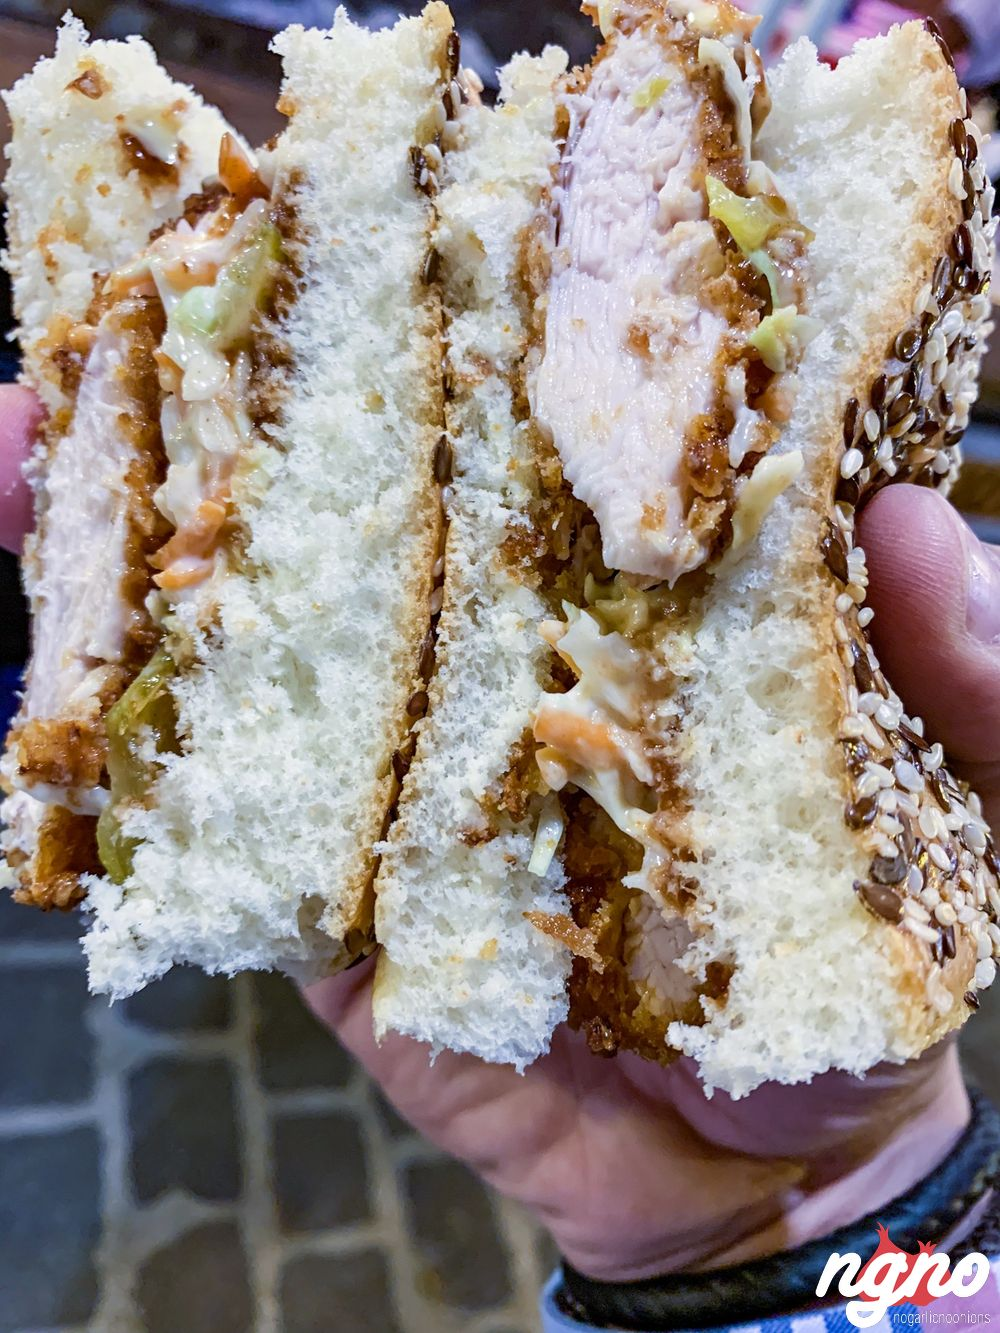 souk-el-akel-thursday-street-food-lebanon-food-nogarlicnoonions-1062018-11-18-01-43-02